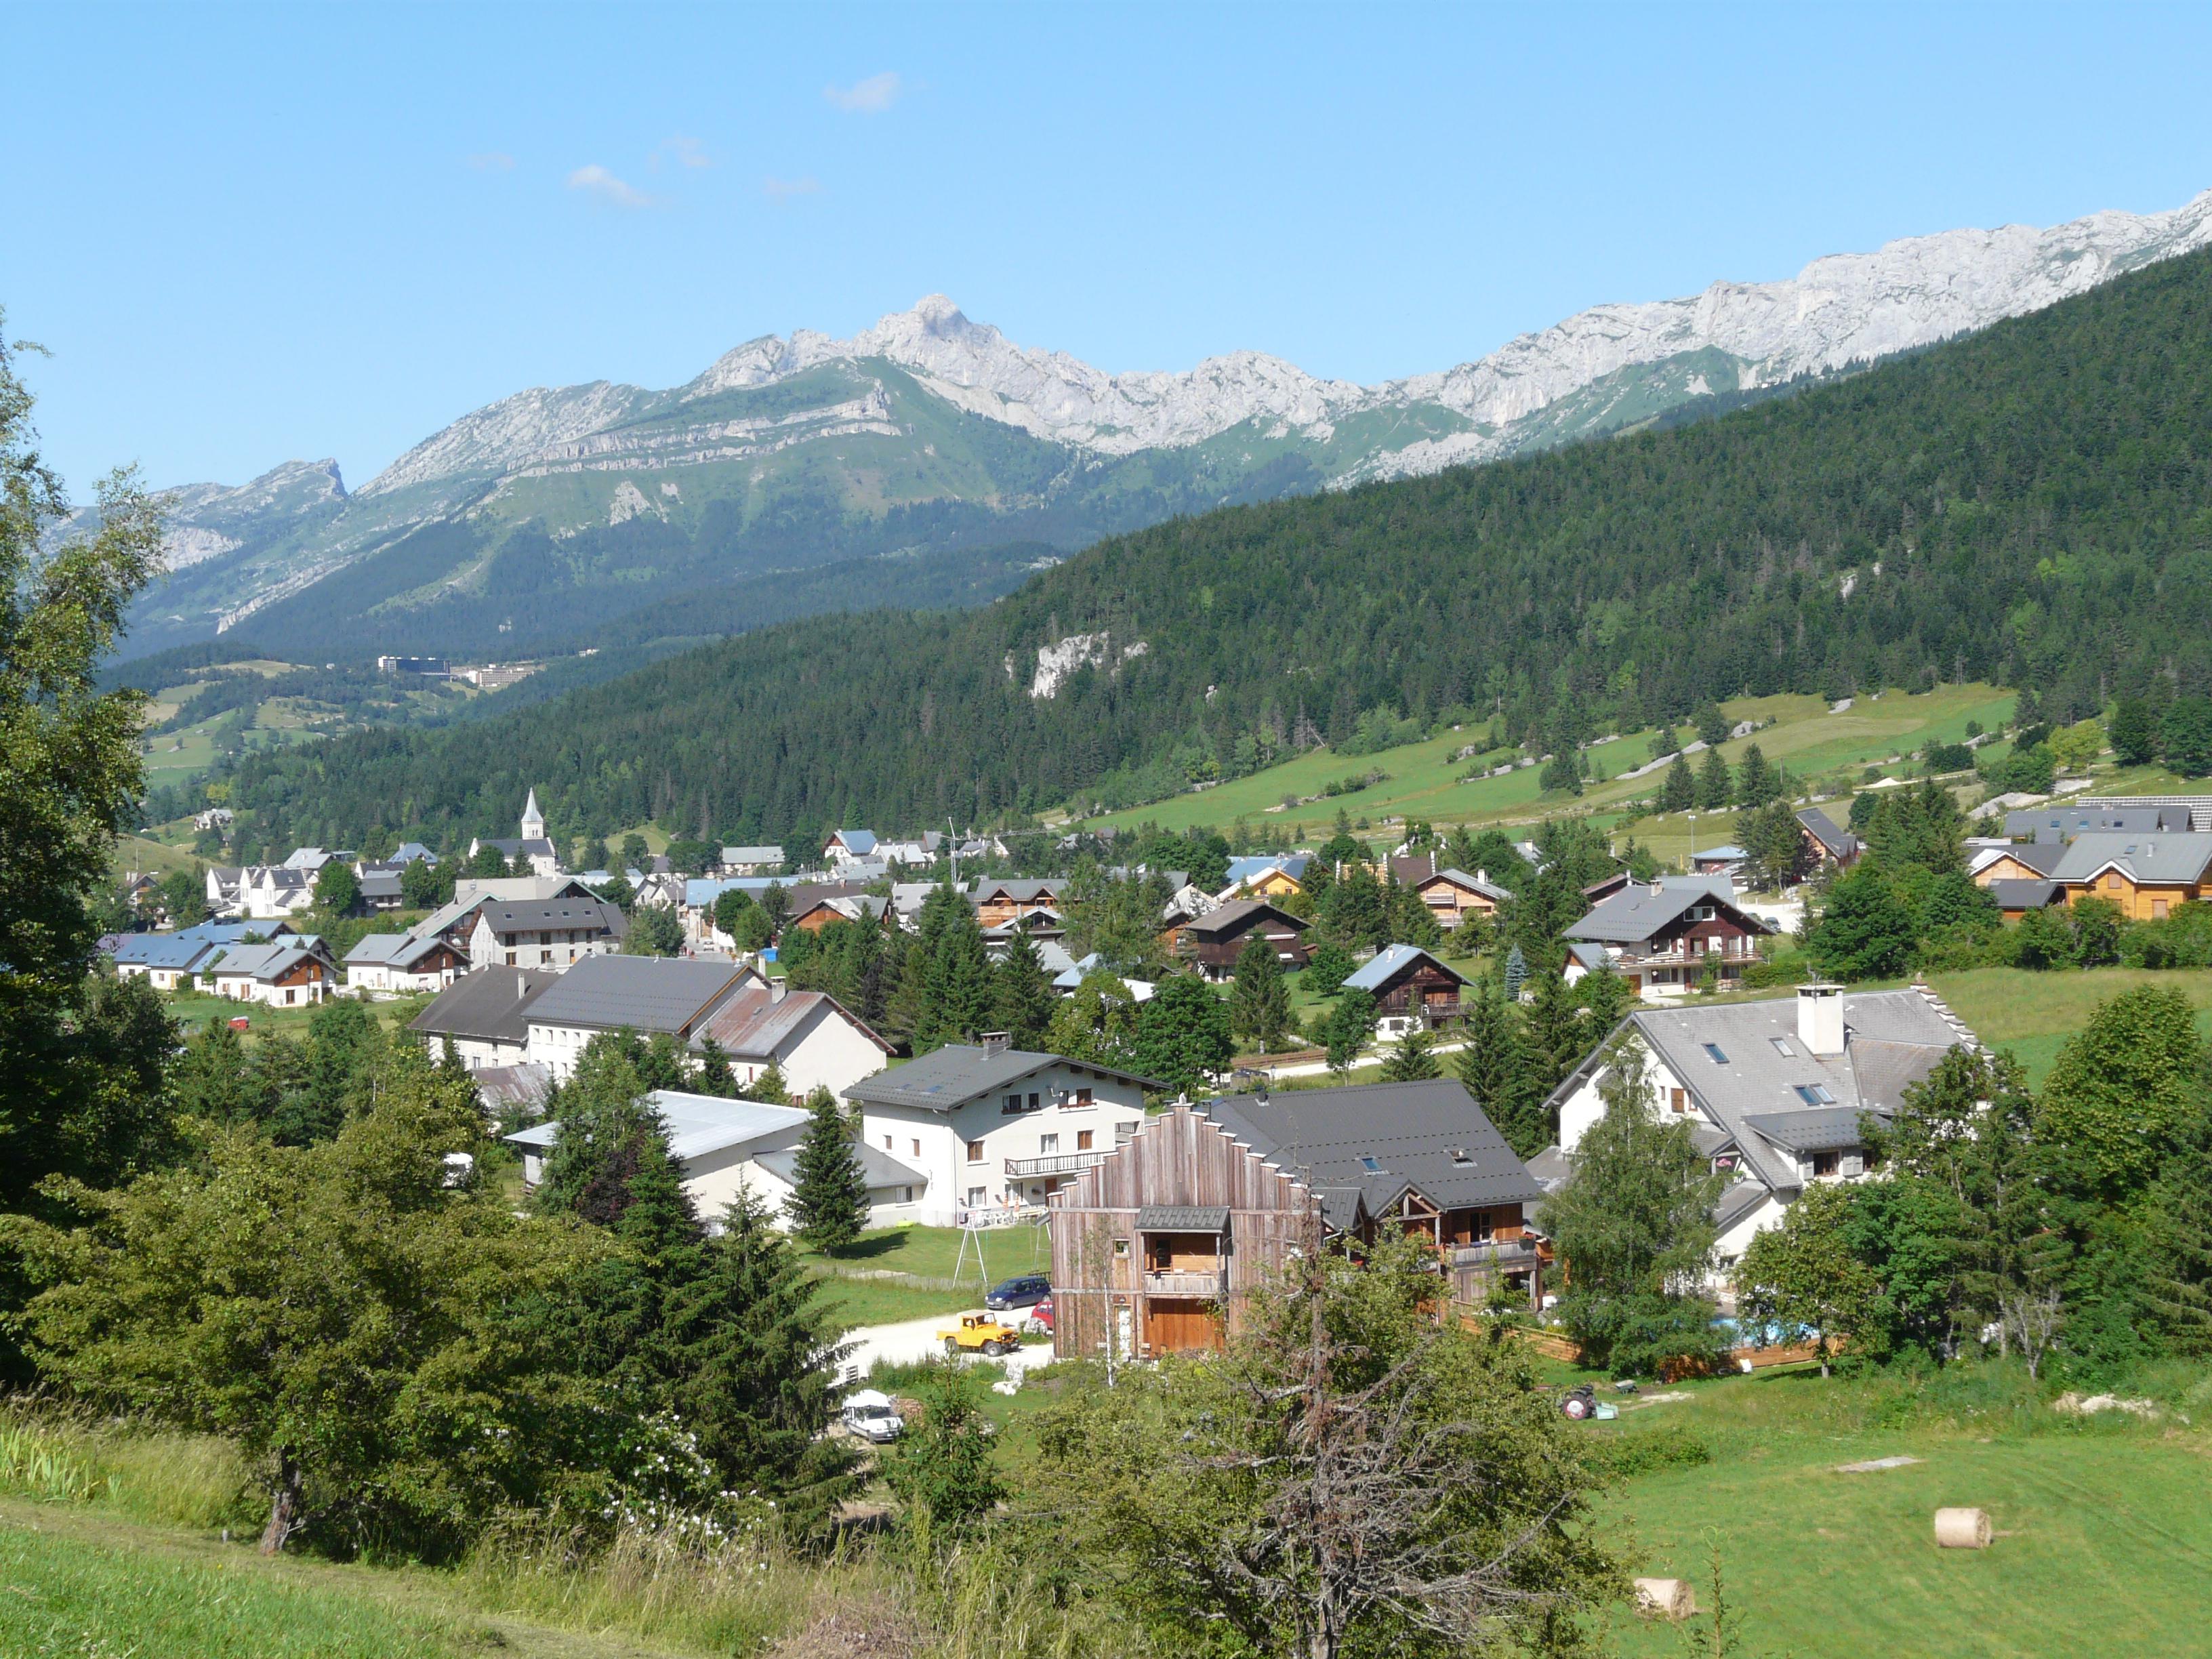 Auvergne rh ne alpes tourisme corren on en vercors - Office de tourisme de correncon en vercors ...